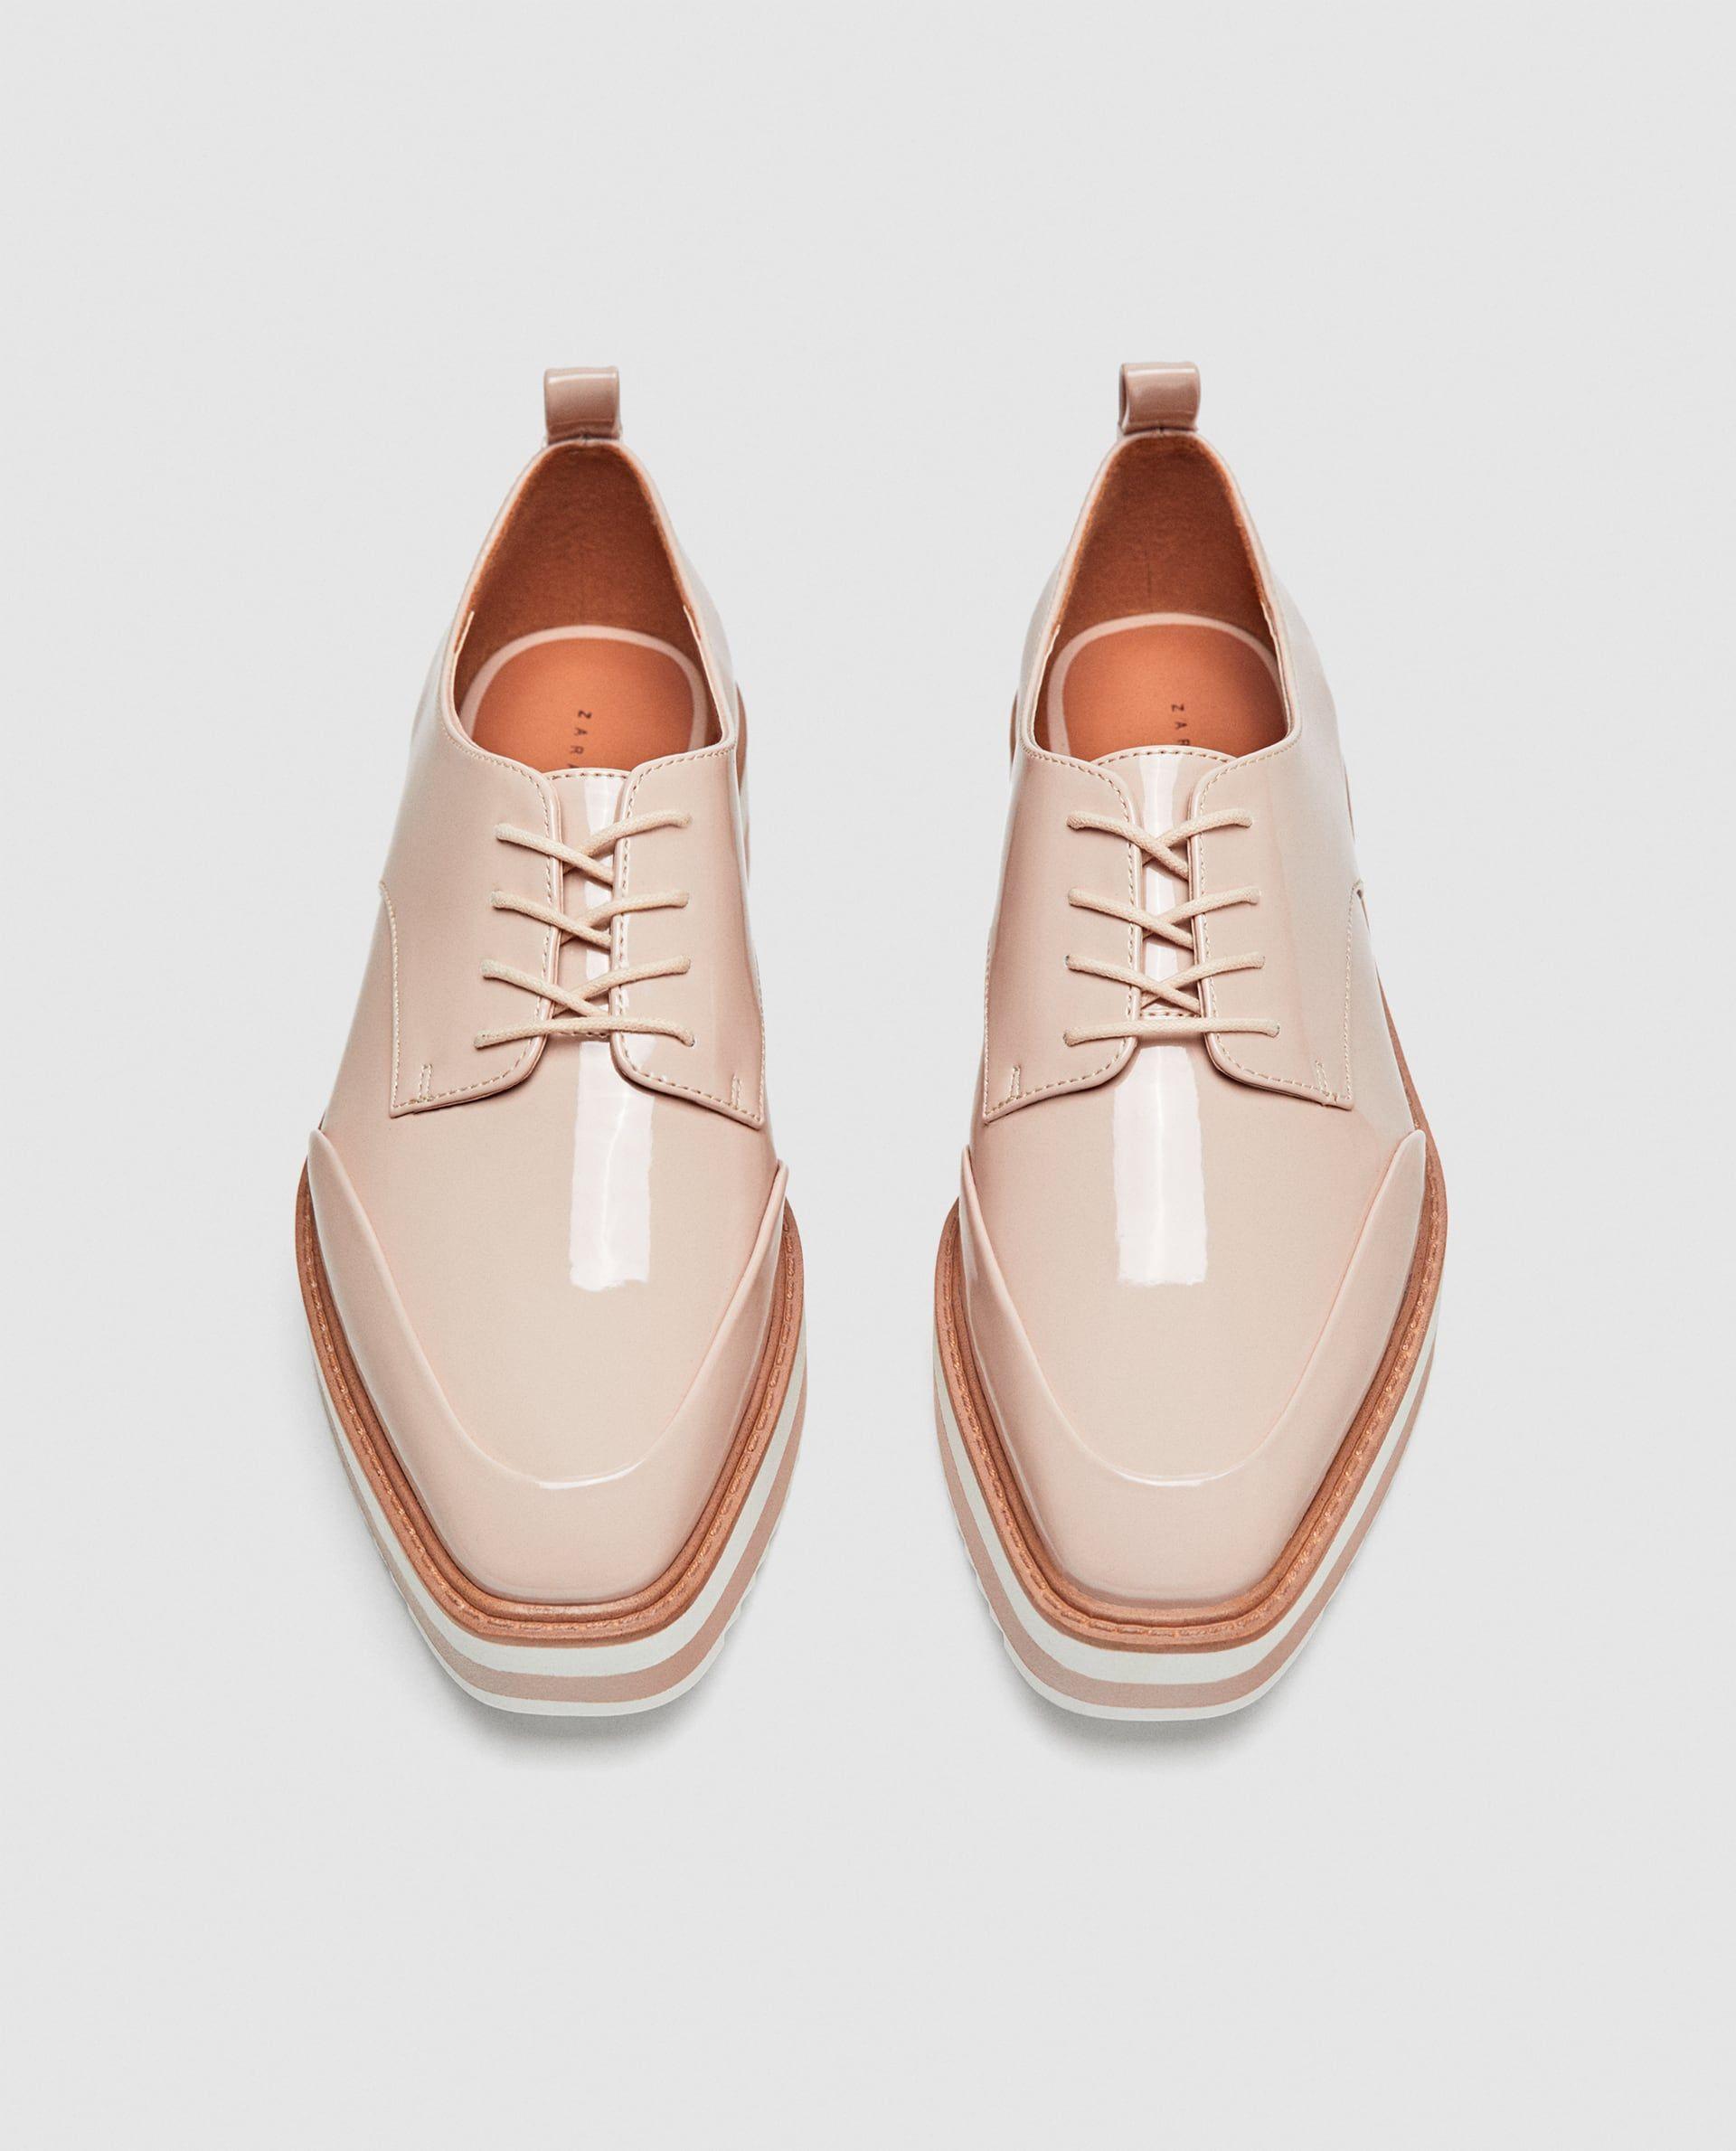 Zara Mujer Blucher Plataforma Rayas Oxford Schuhe Outfit Zara Schuhe Schuhe Frauen